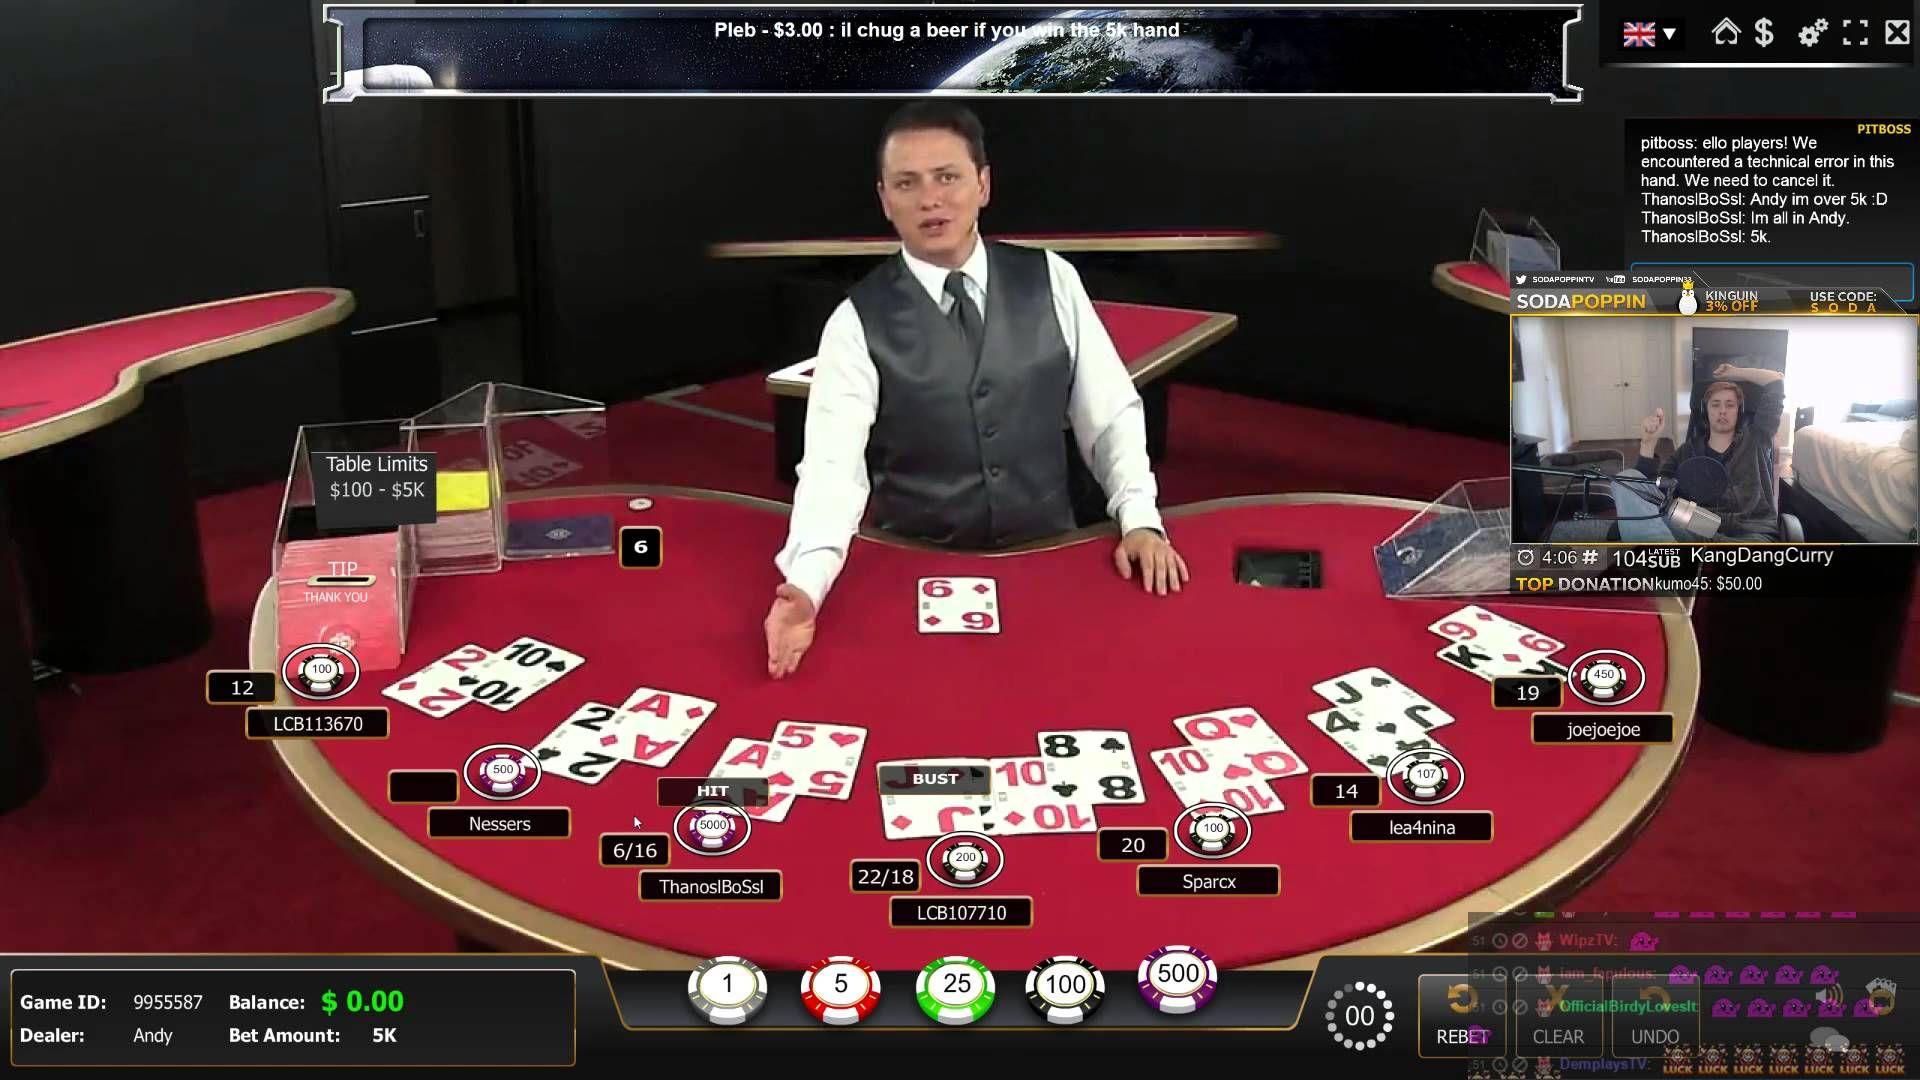 5000 BET (real money) online gambling Did he win or lose